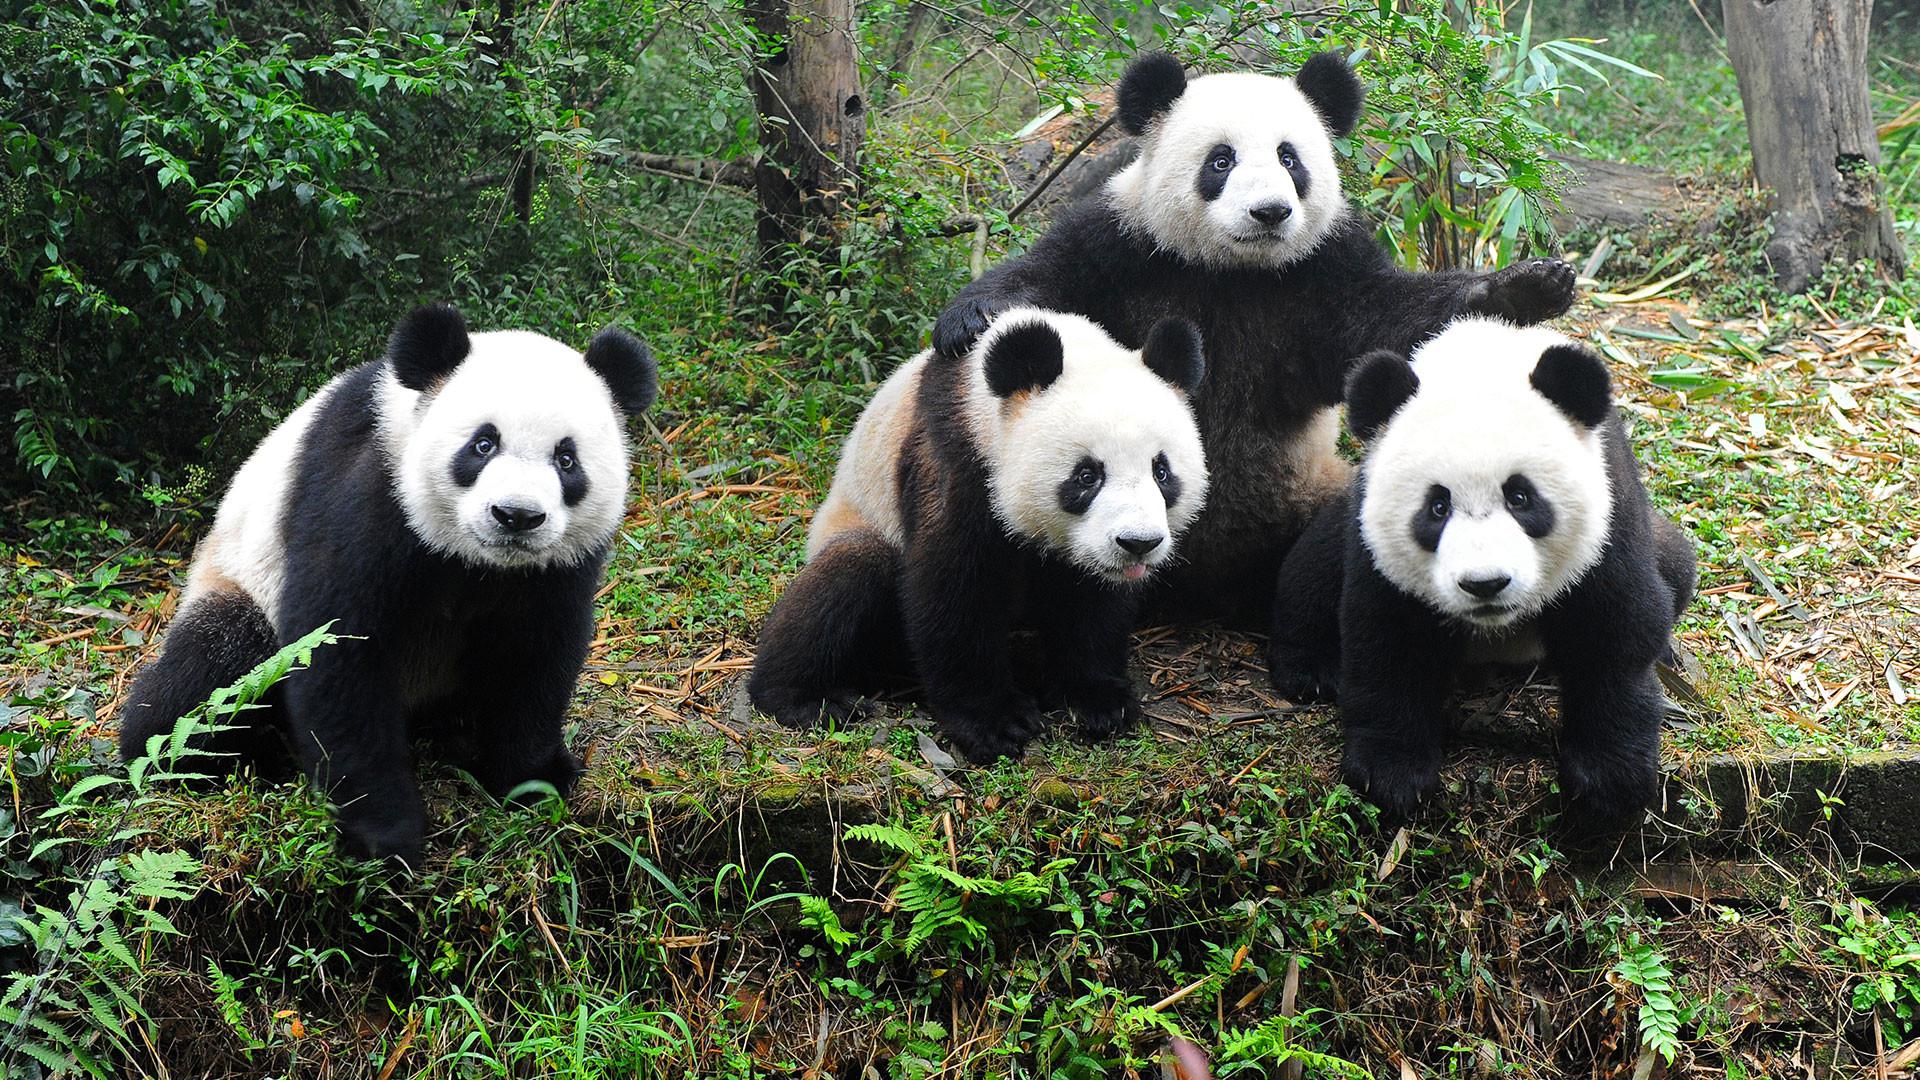 Baby panda cartoon wallpaper – photo#21